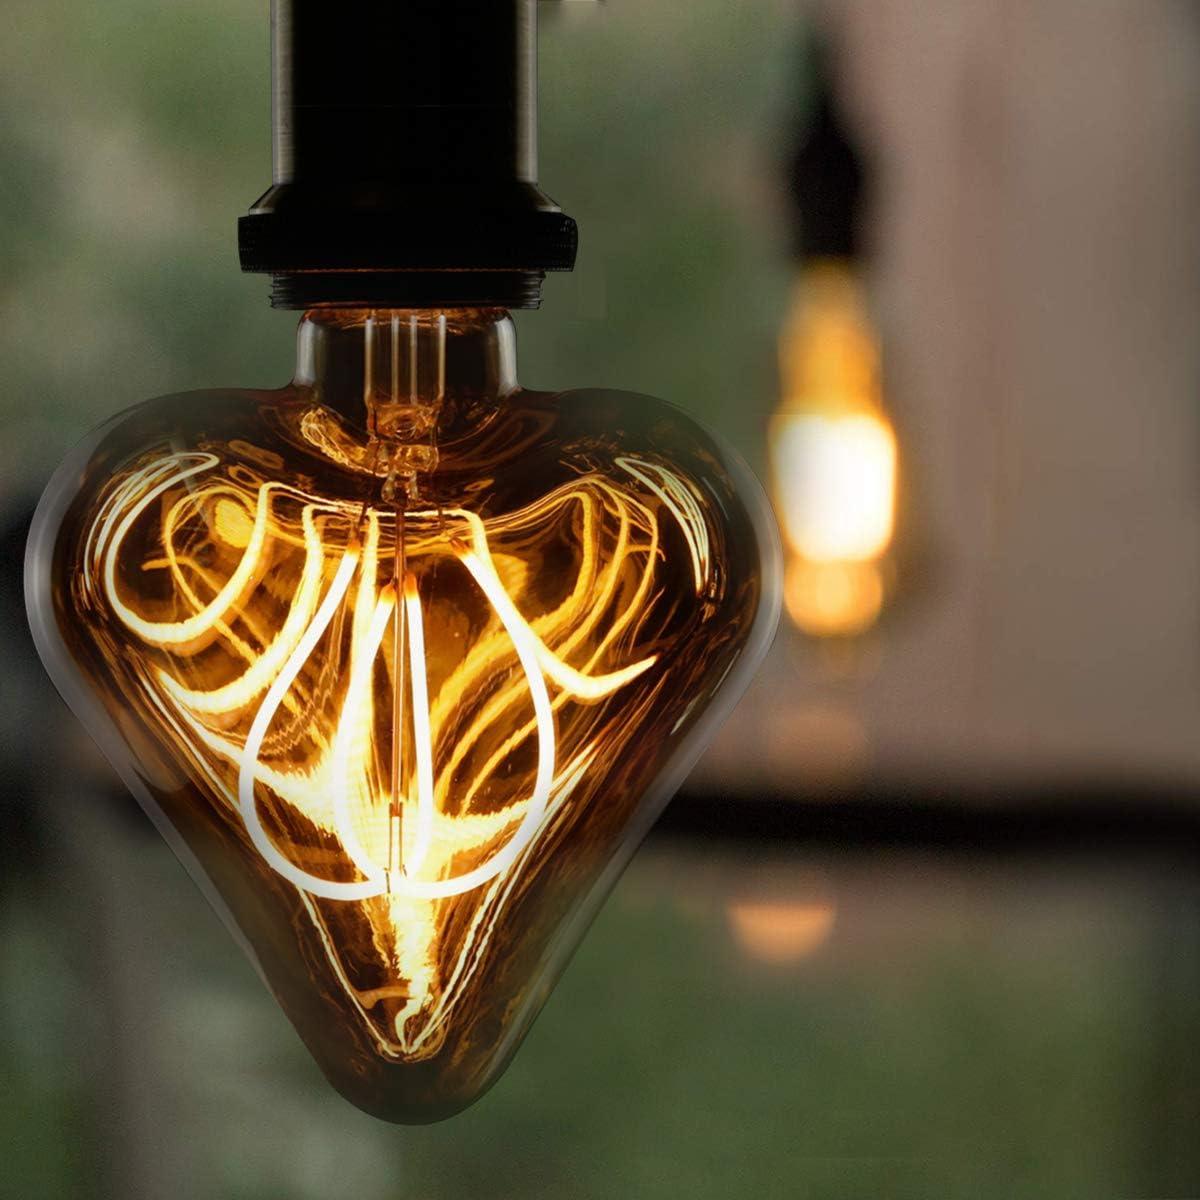 6X Edison Gl/ühbirne LED LED Filament Kerzenlampe Warmwei/ß Antike Nostalgie Beleuchtung im Haus Caf/é Bar Restaurant Nicht Dimmbar GBLY Vintage Gl/ühbirne Kronleuchter in Kerzenform mit E14-Sockel